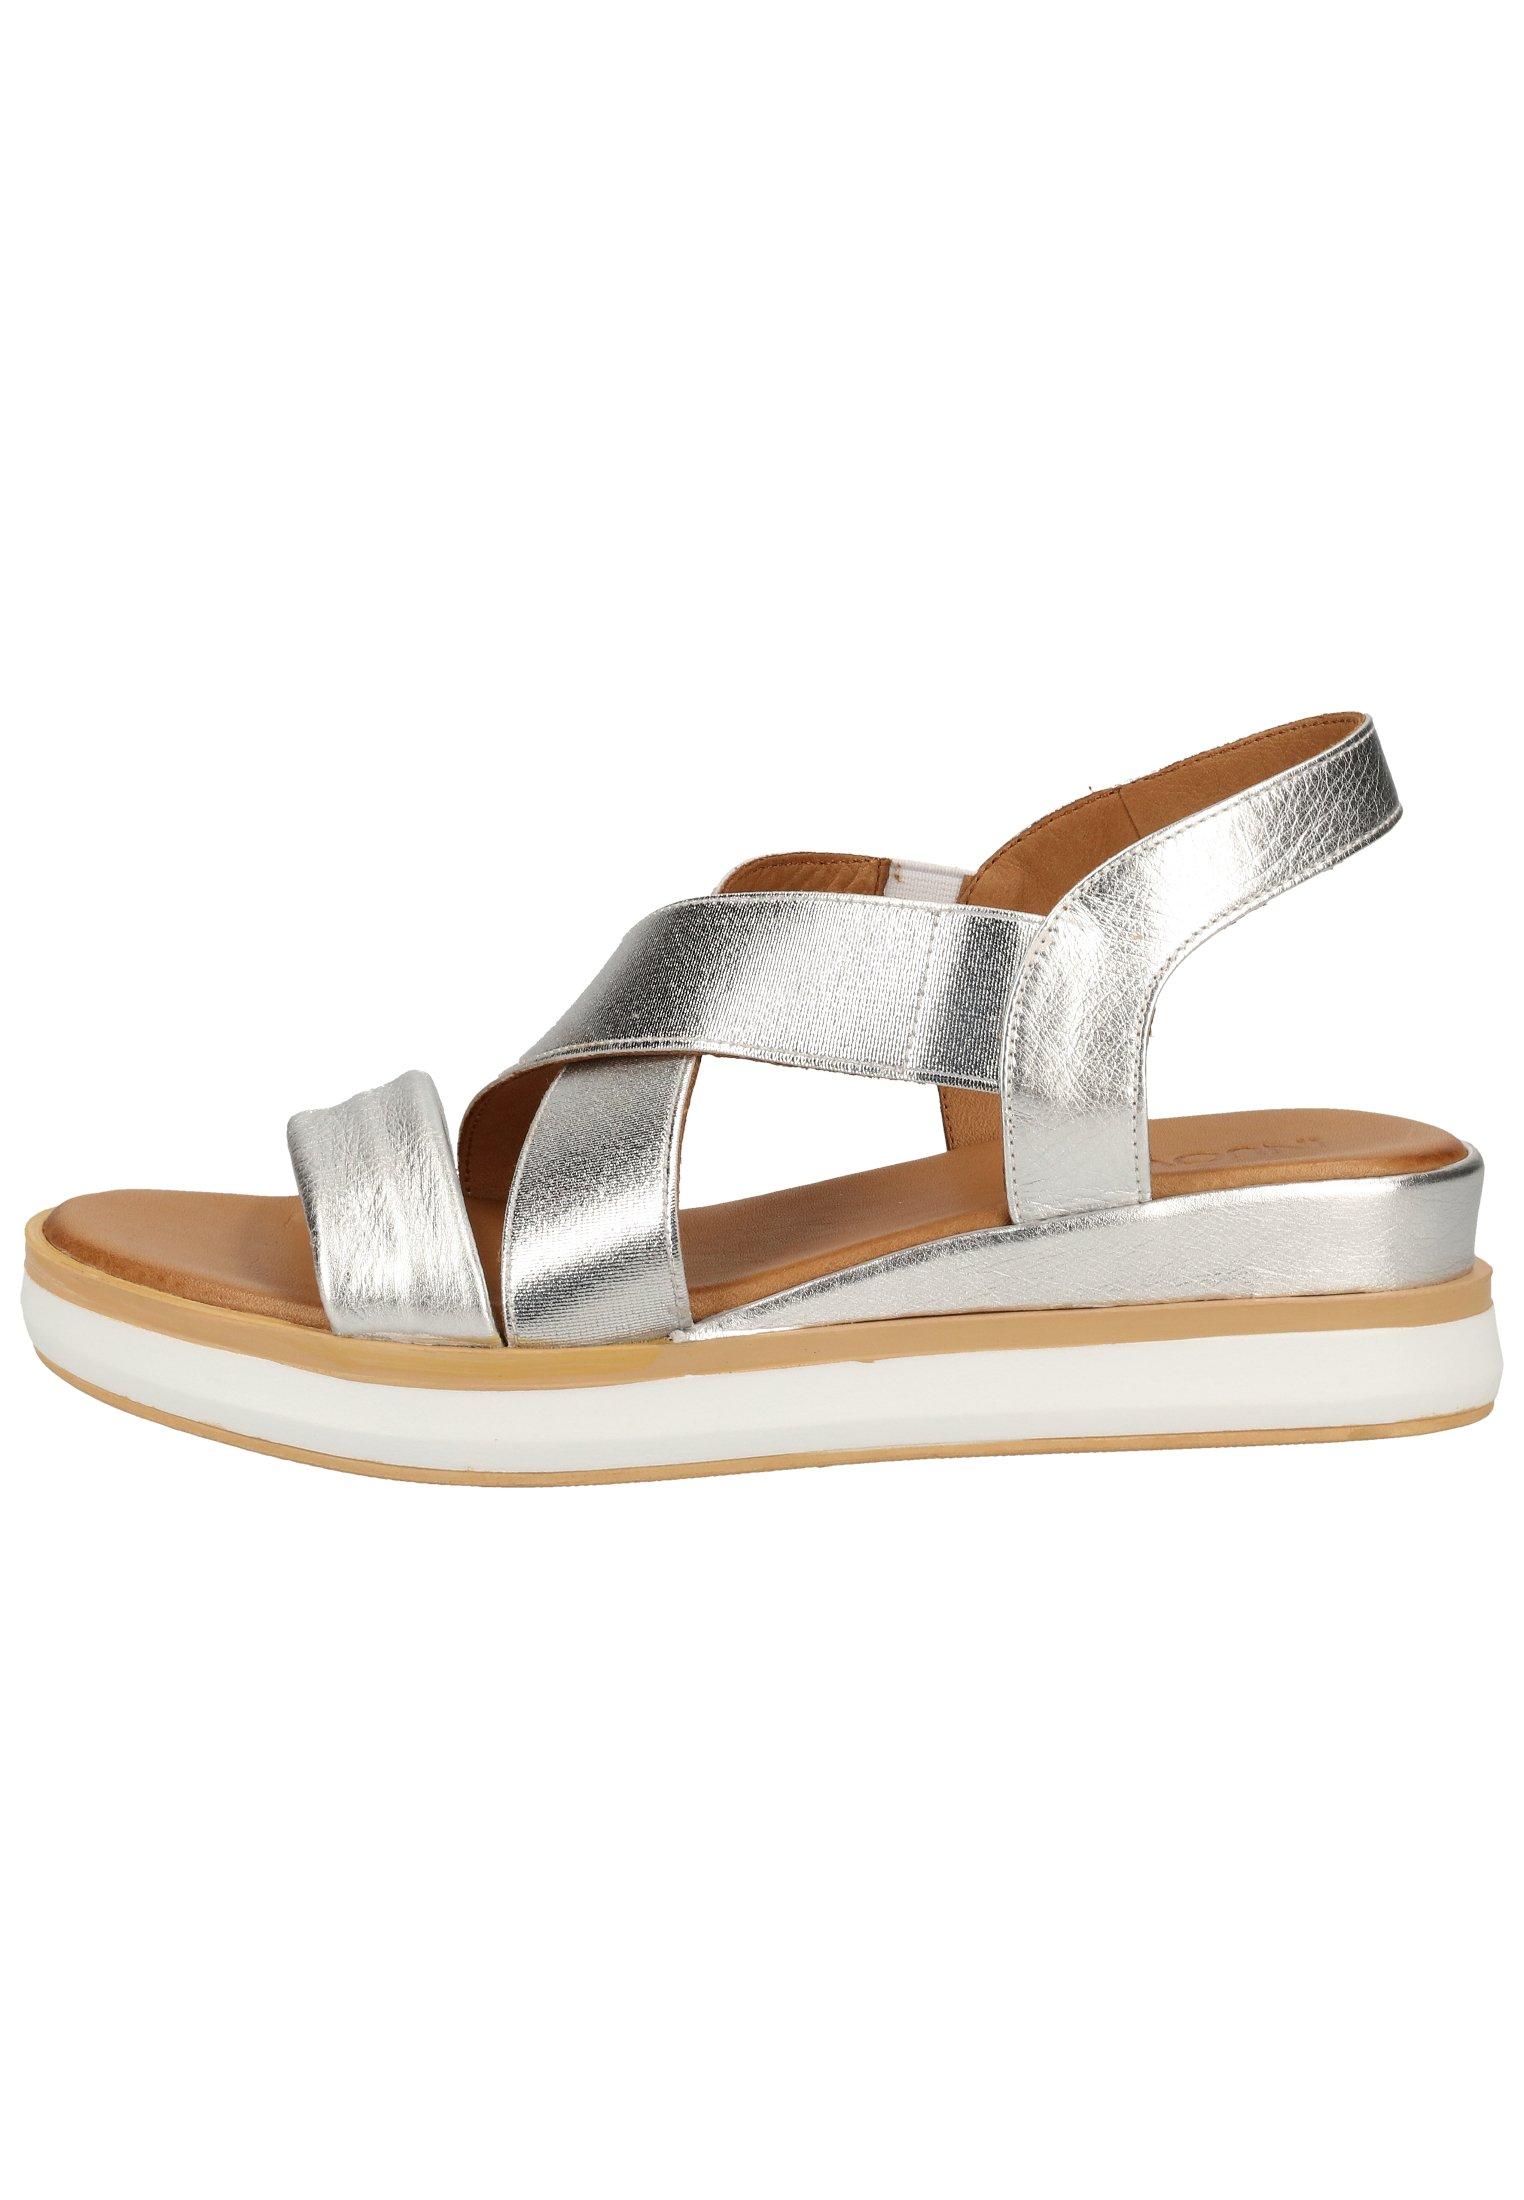 Sandalen met plateauzool silver slv